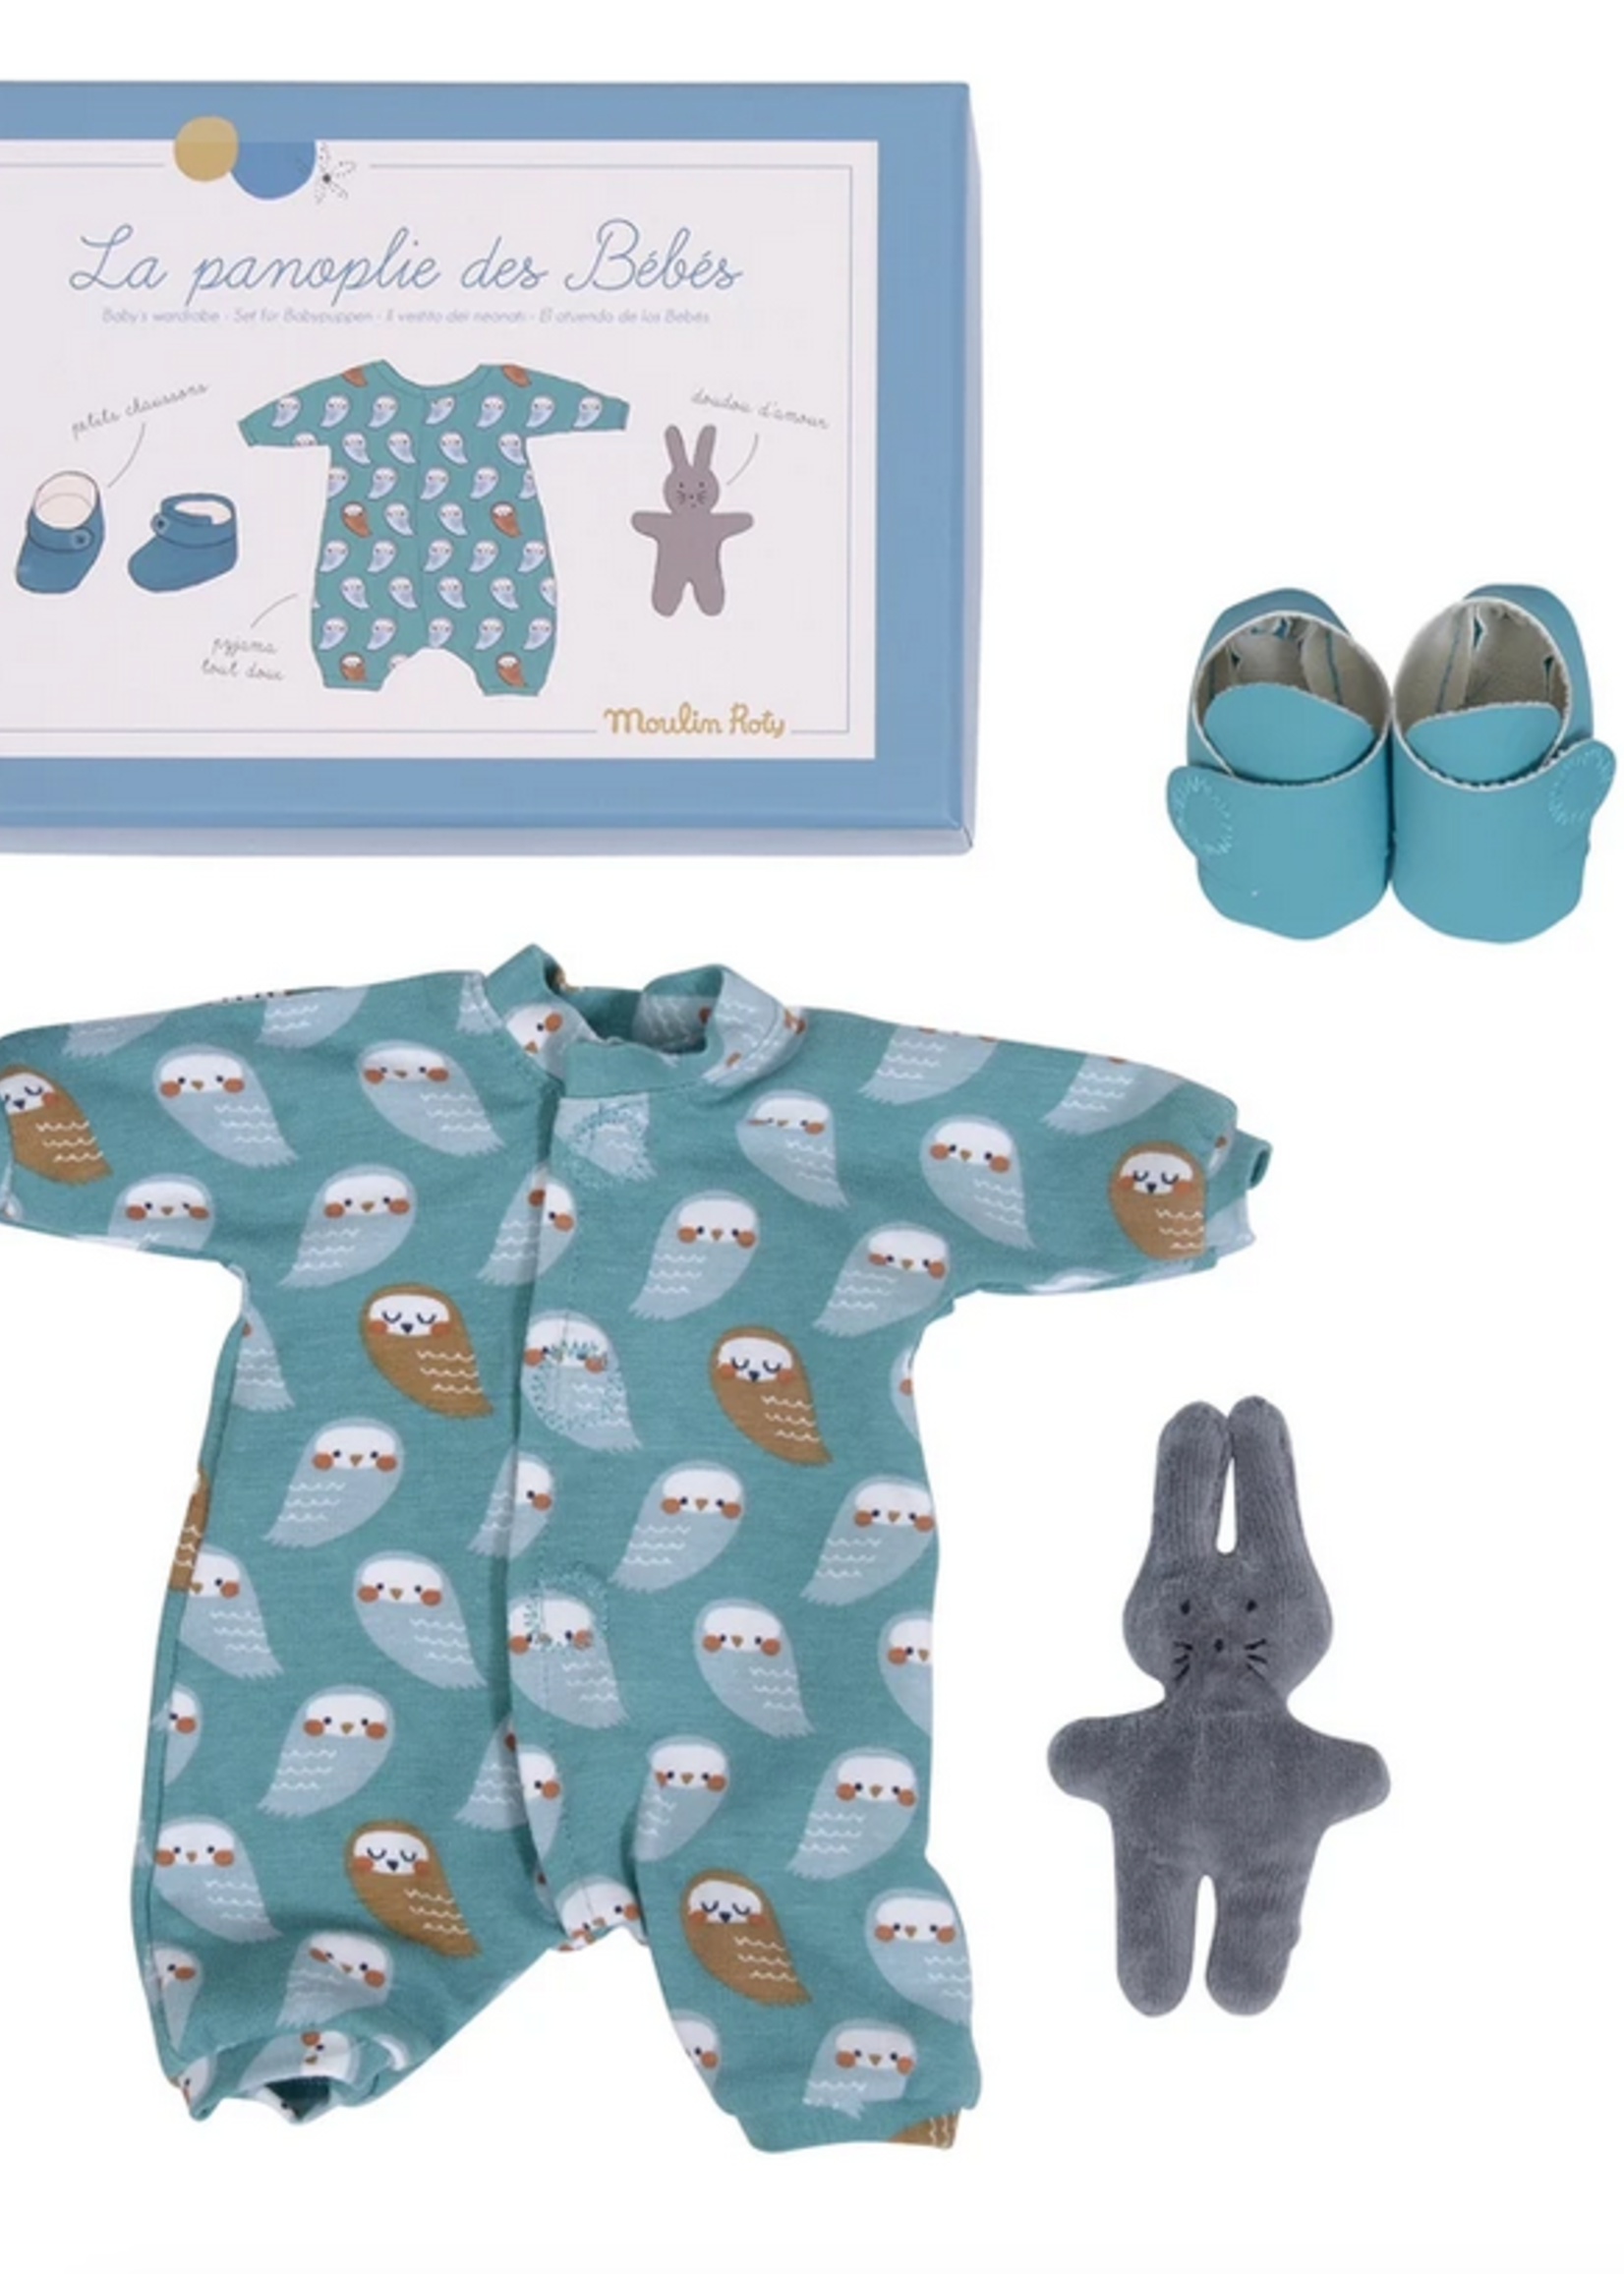 Mideer Midder-ss21 Bebes - baby's wardrobe   Code: 710529